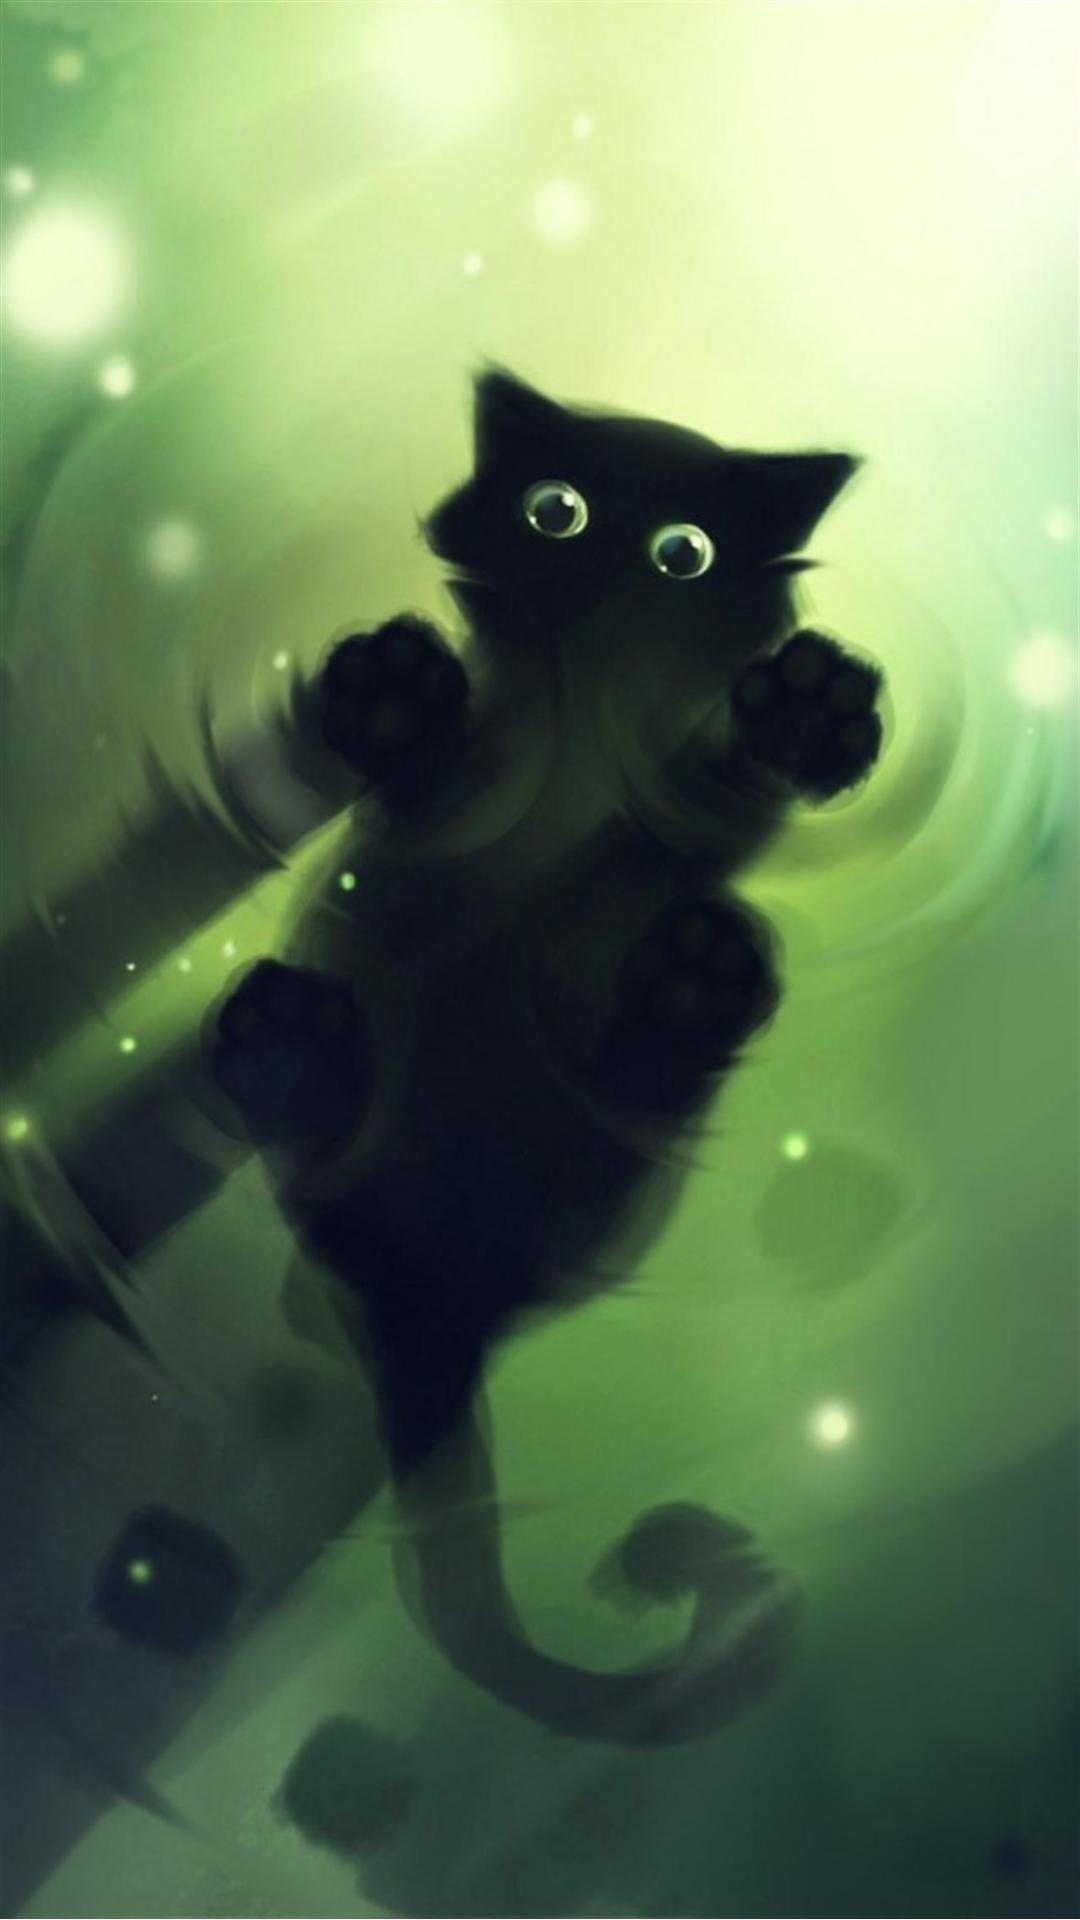 pin 3d black cat - photo #28